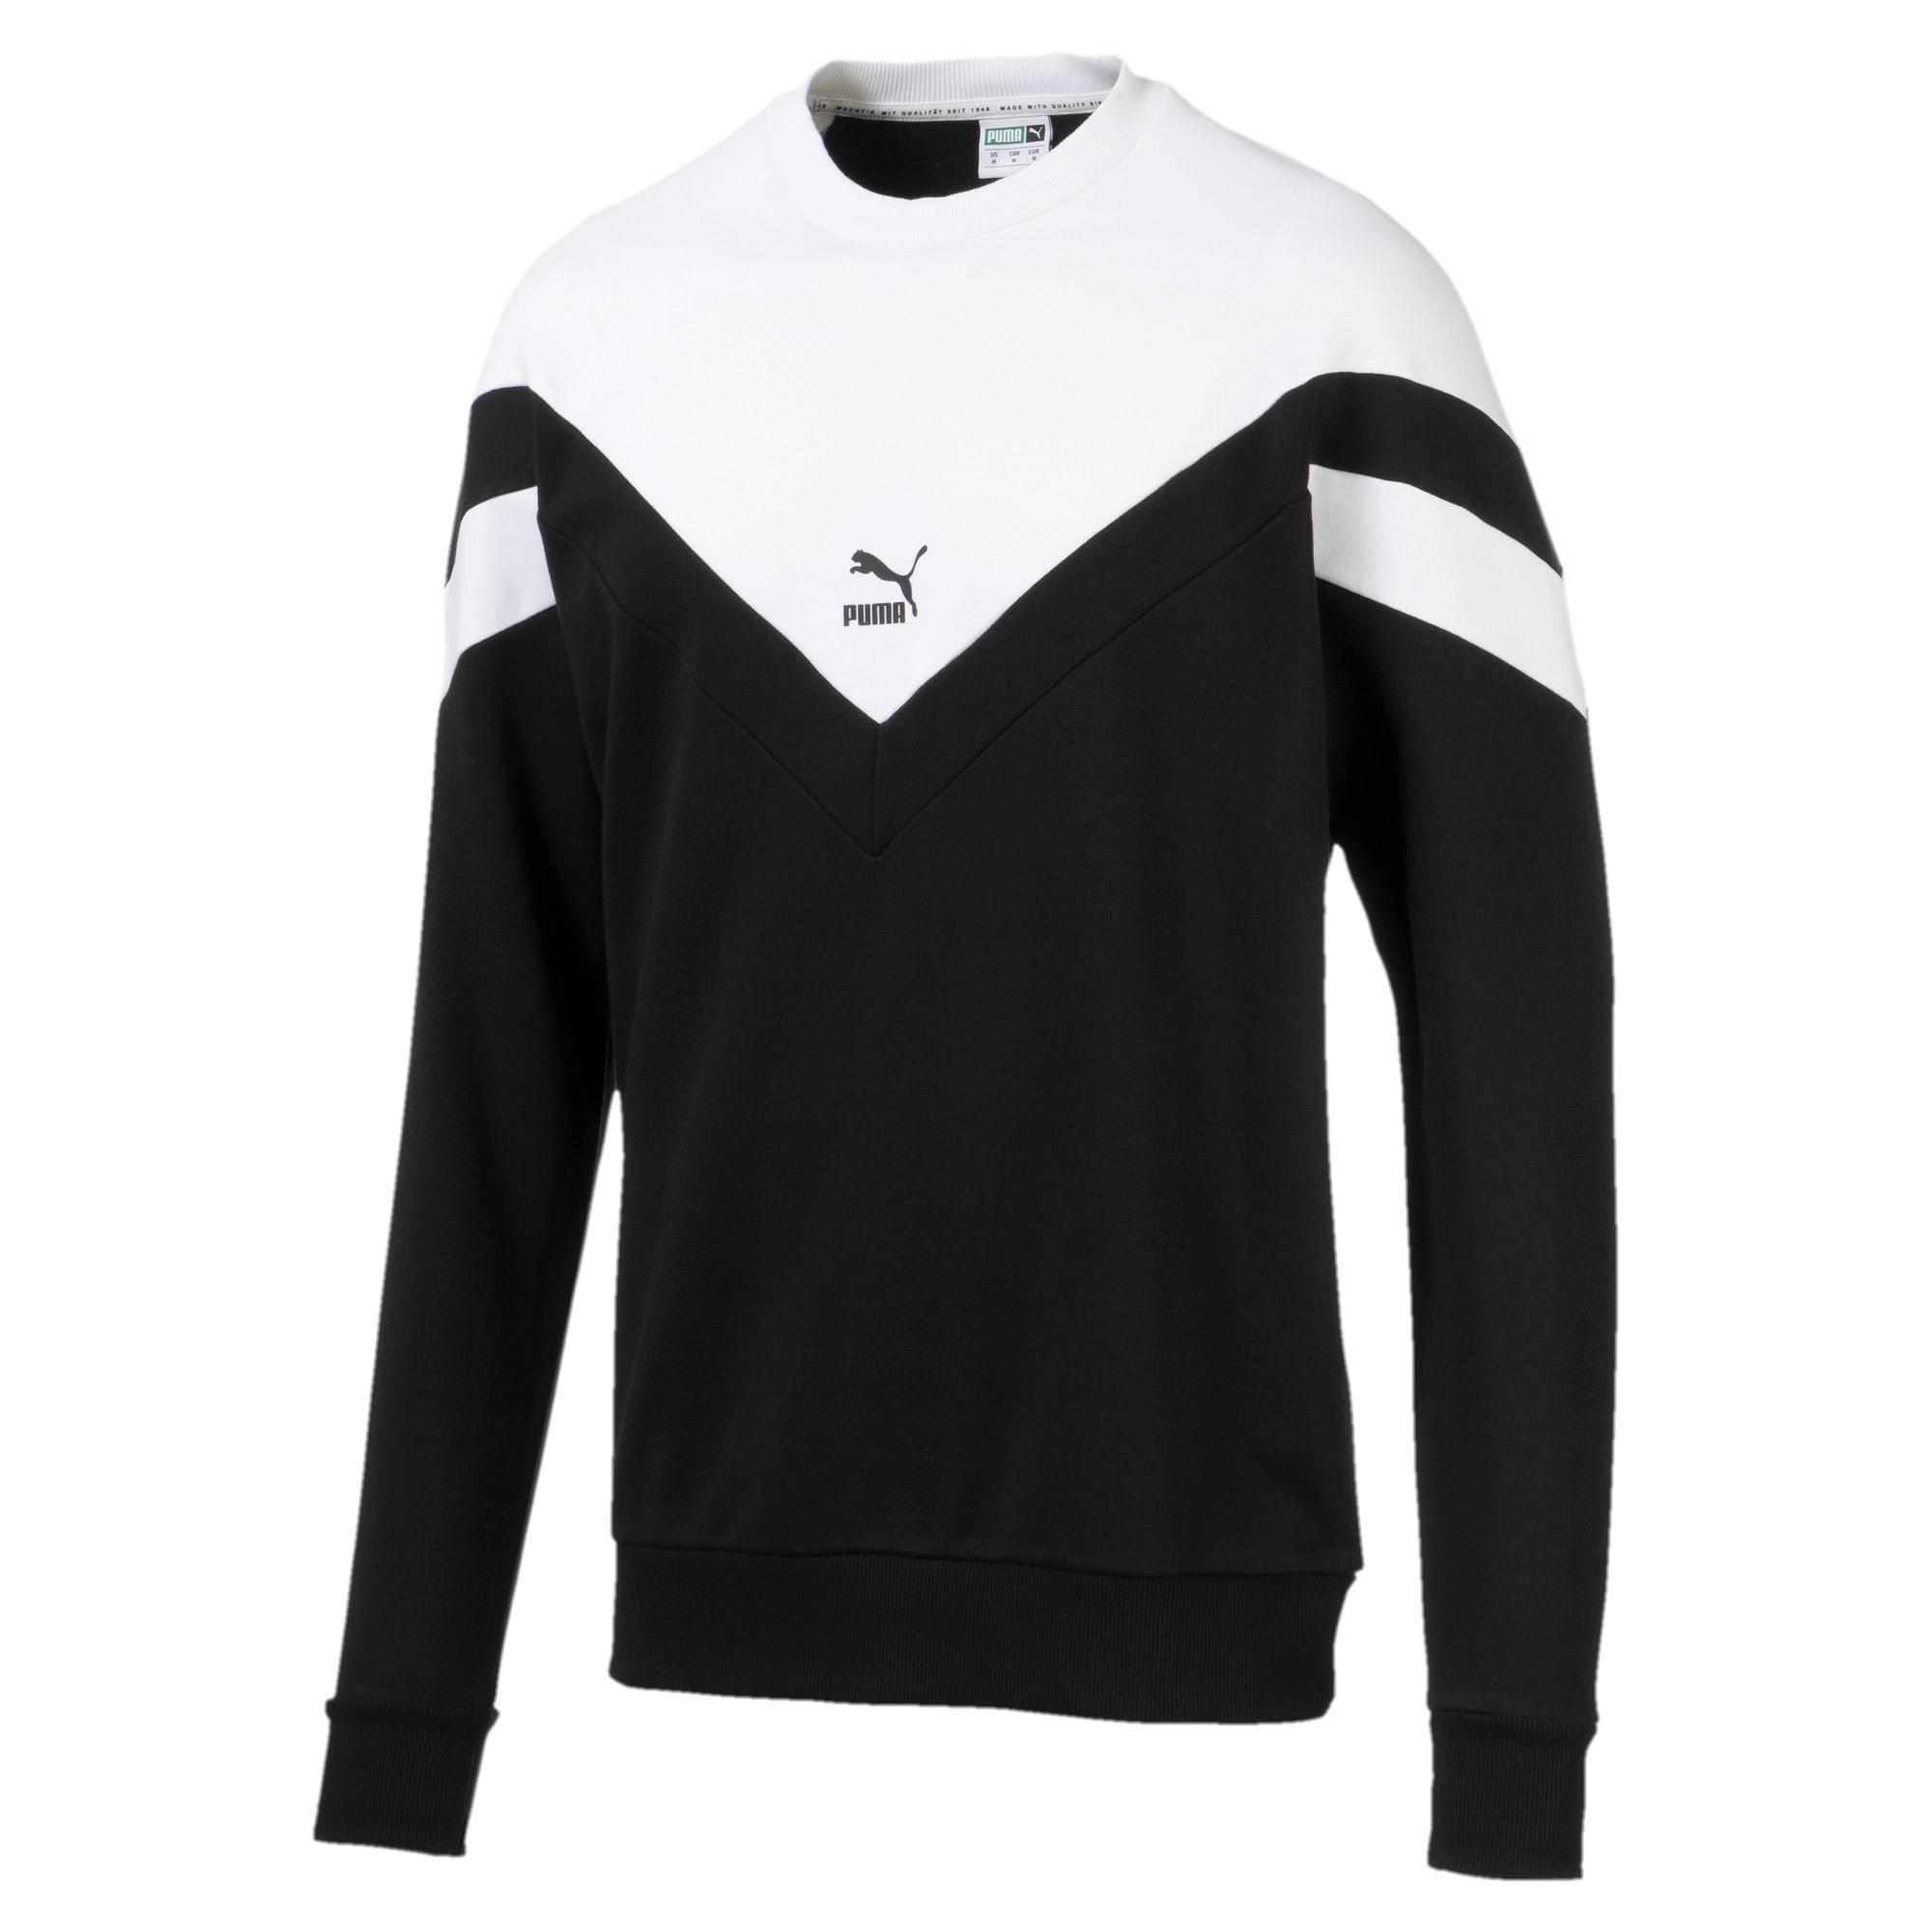 Thumbnail 1 of Iconic MCS Herren Sweatshirt, Puma Black, medium